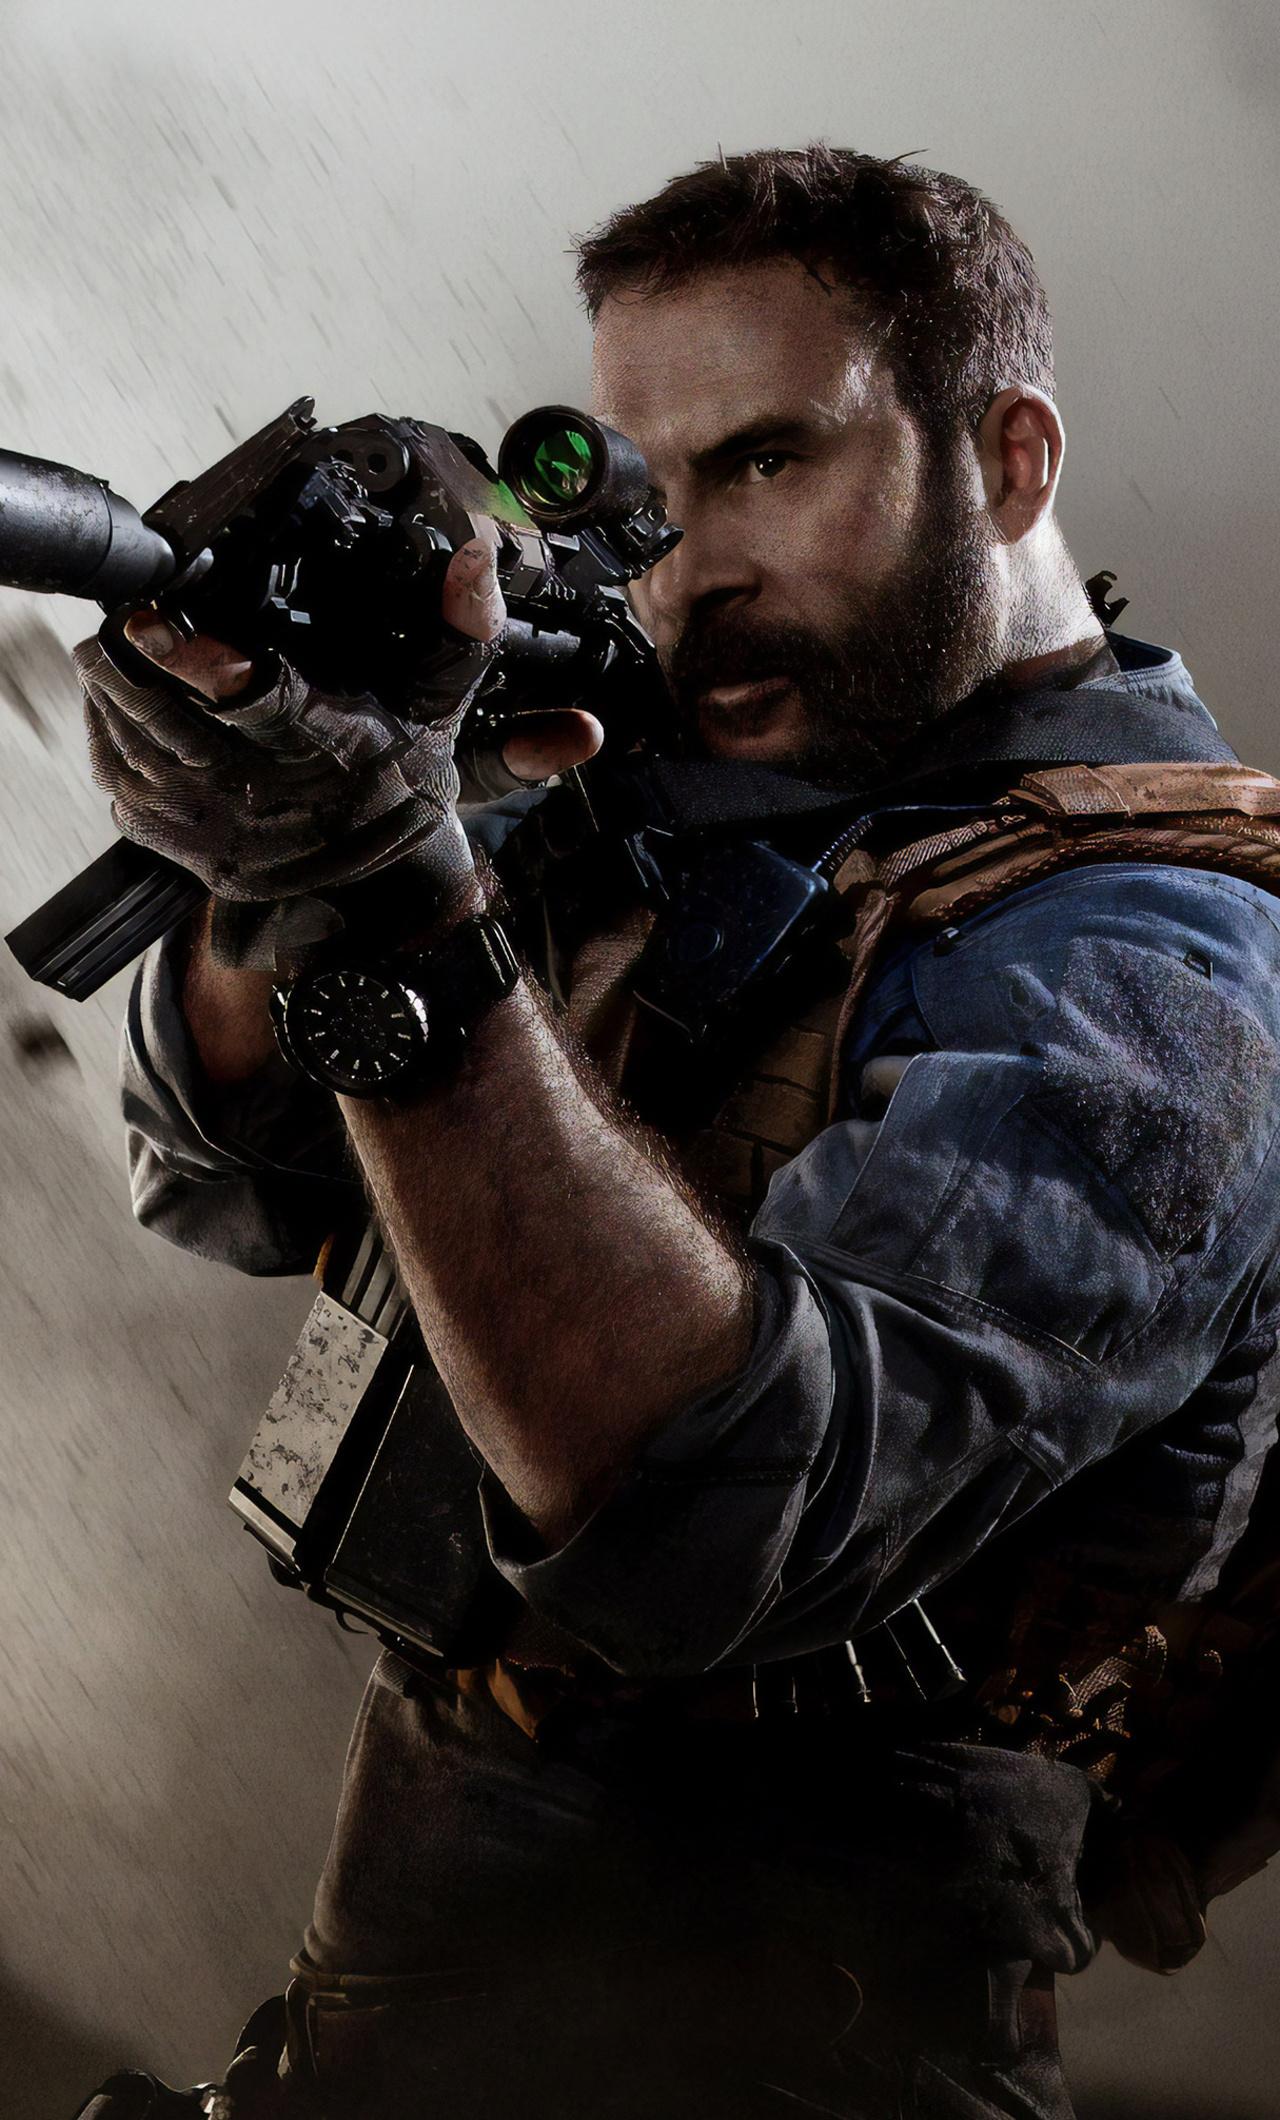 1280x2120 Call Of Duty Modern Warfare 4k Iphone 6 Hd 4k